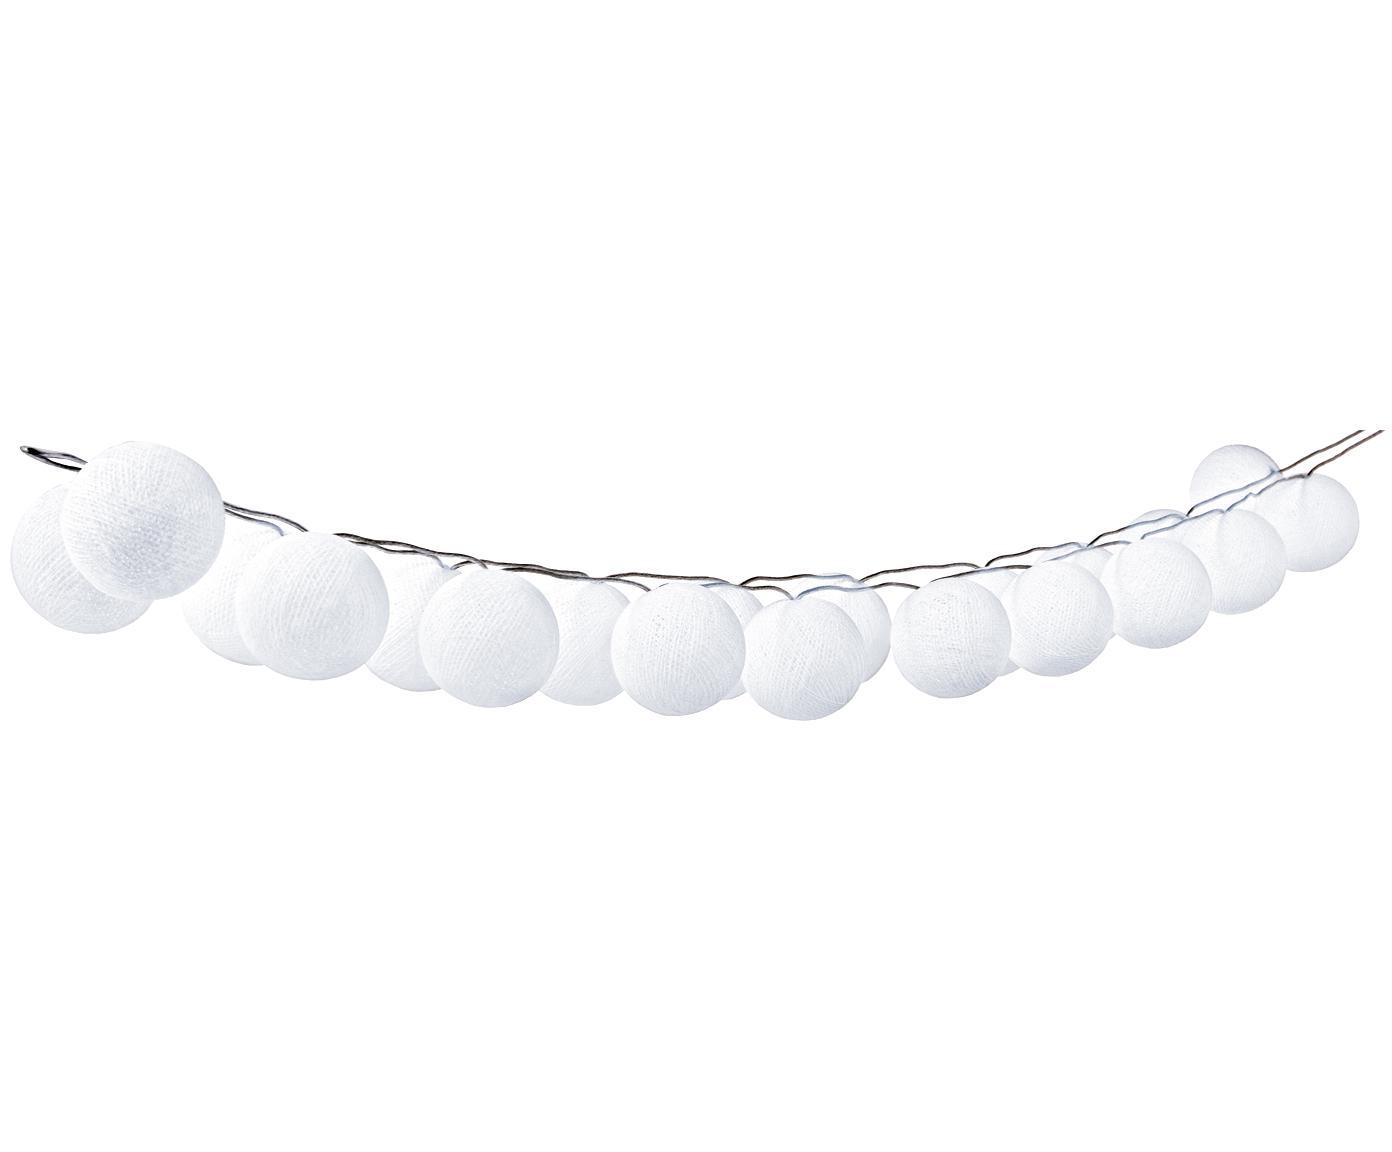 Ghirlanda  a LED Bellin, 320 cm, Lanterne: cotone, Bianco, Lung. 320 cm